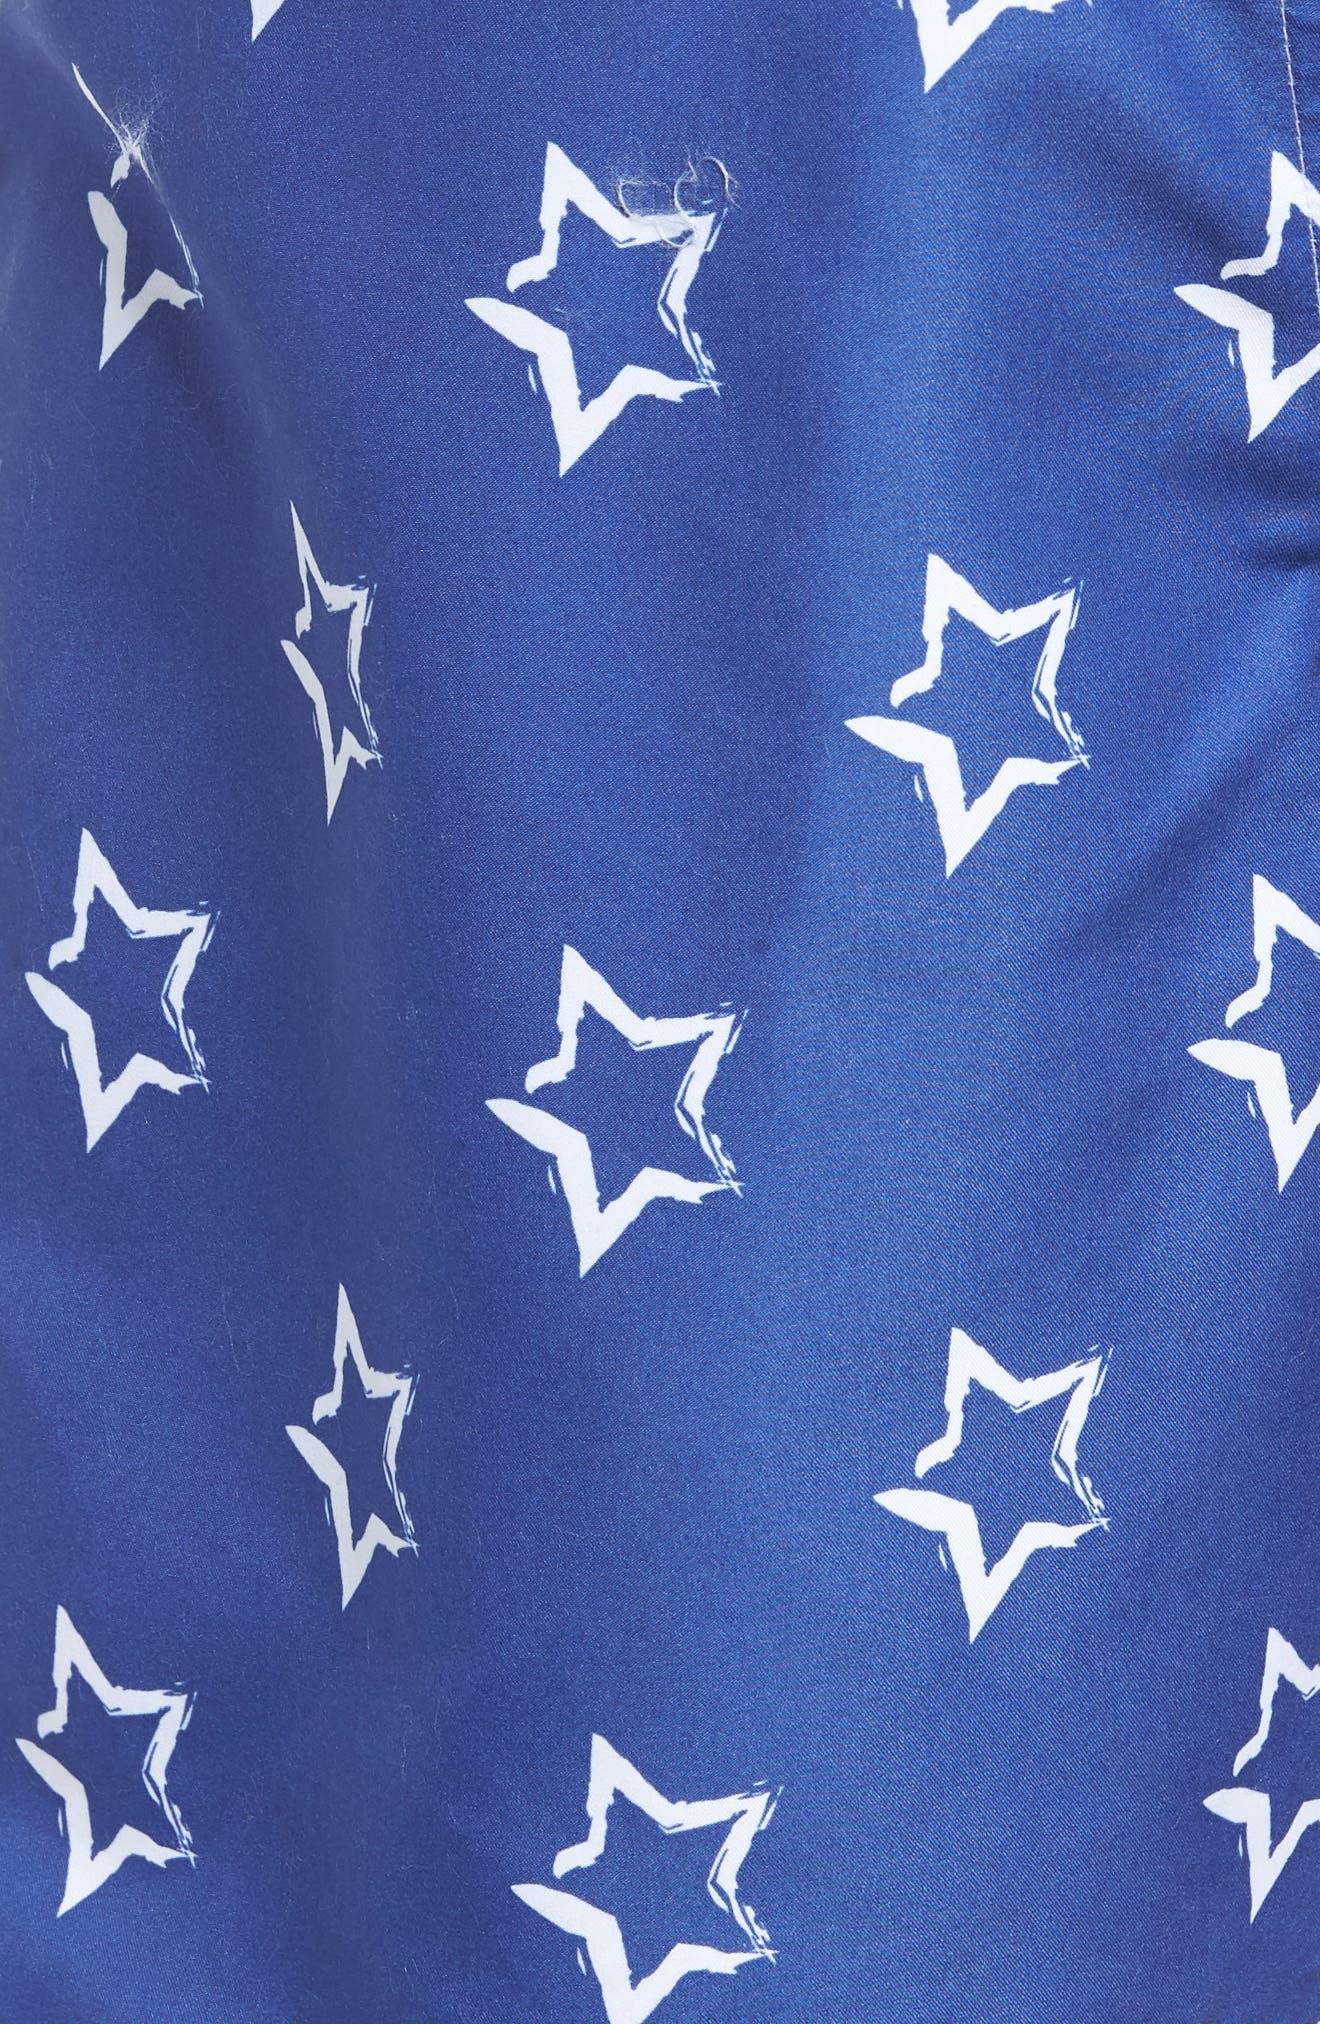 Star Print Swim Trunks,                             Alternate thumbnail 5, color,                             BLUE